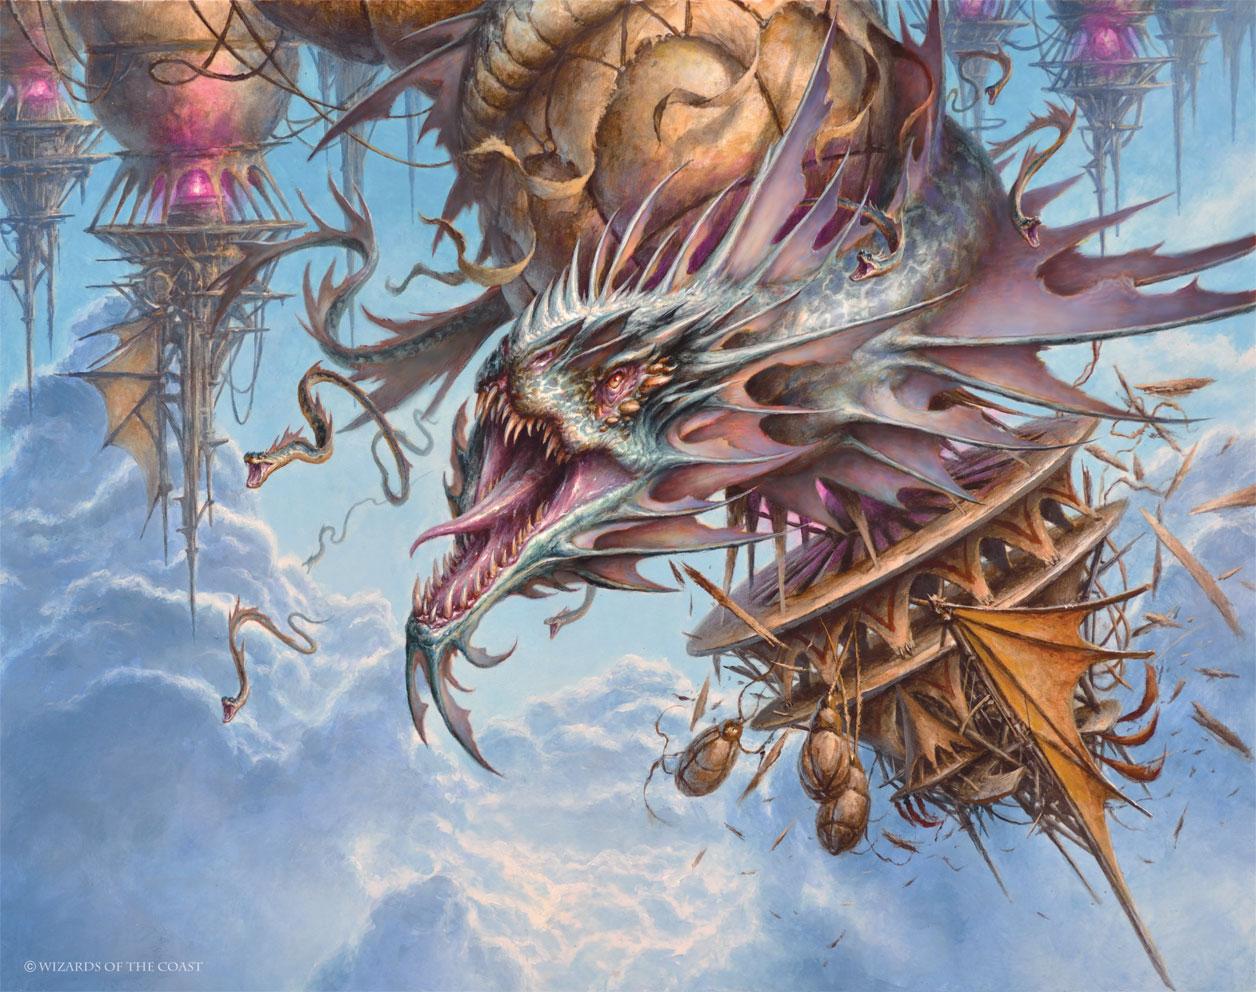 Xyris, the Writhing Storm